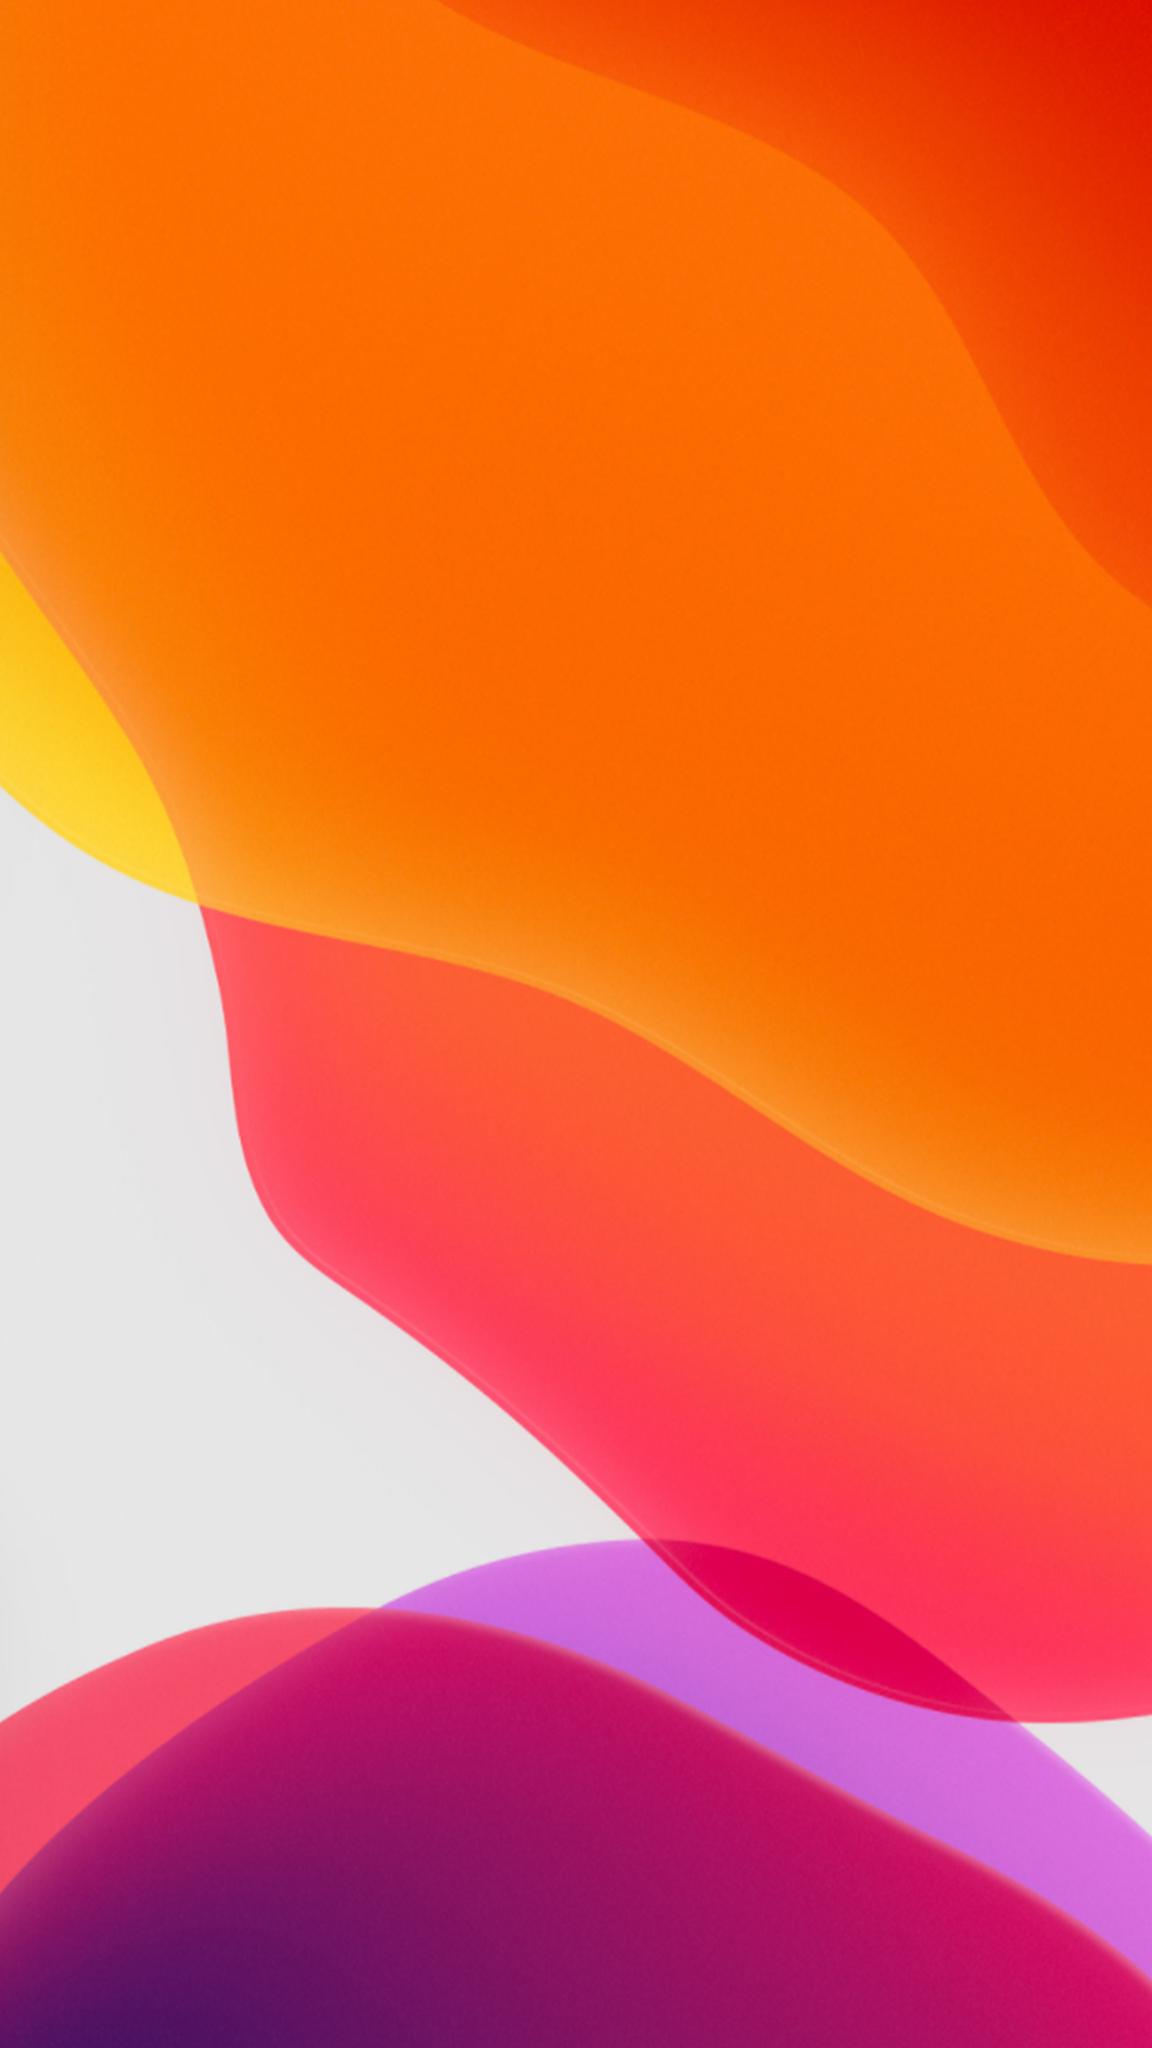 ios-13-wallpaper-TechFoogle-01